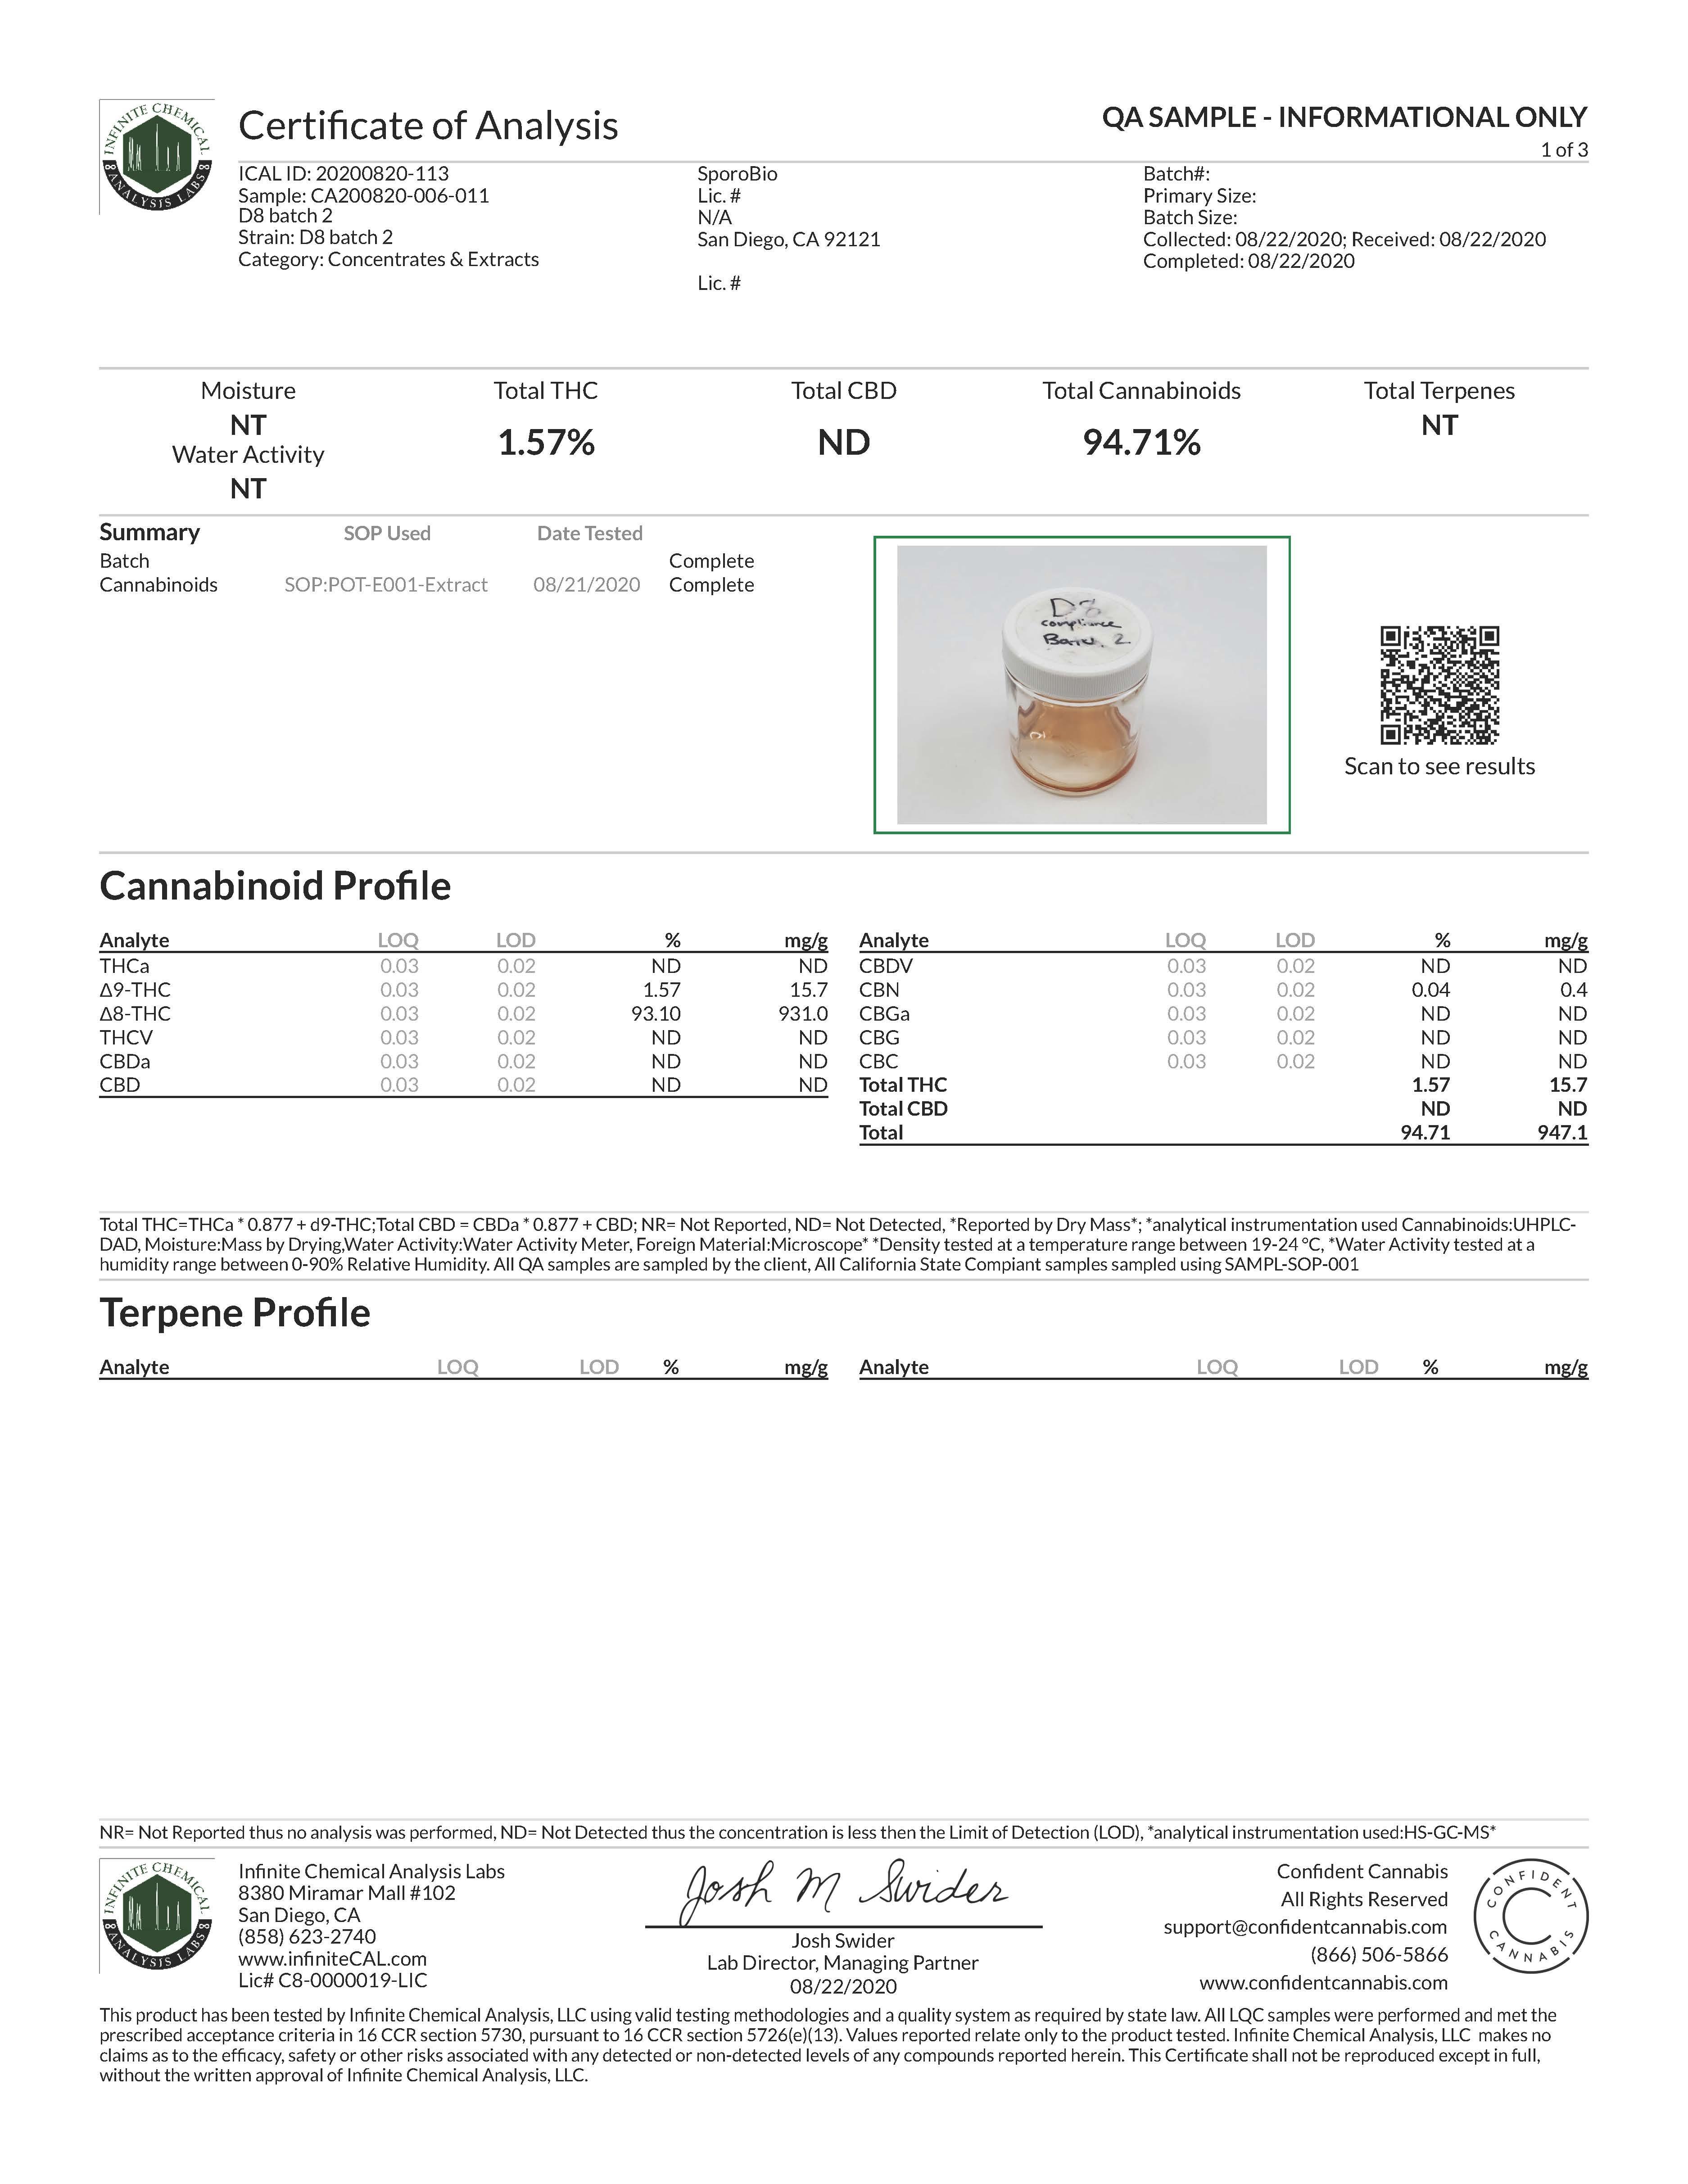 20200822-d8-coa-vape-juice-page-1.jpg